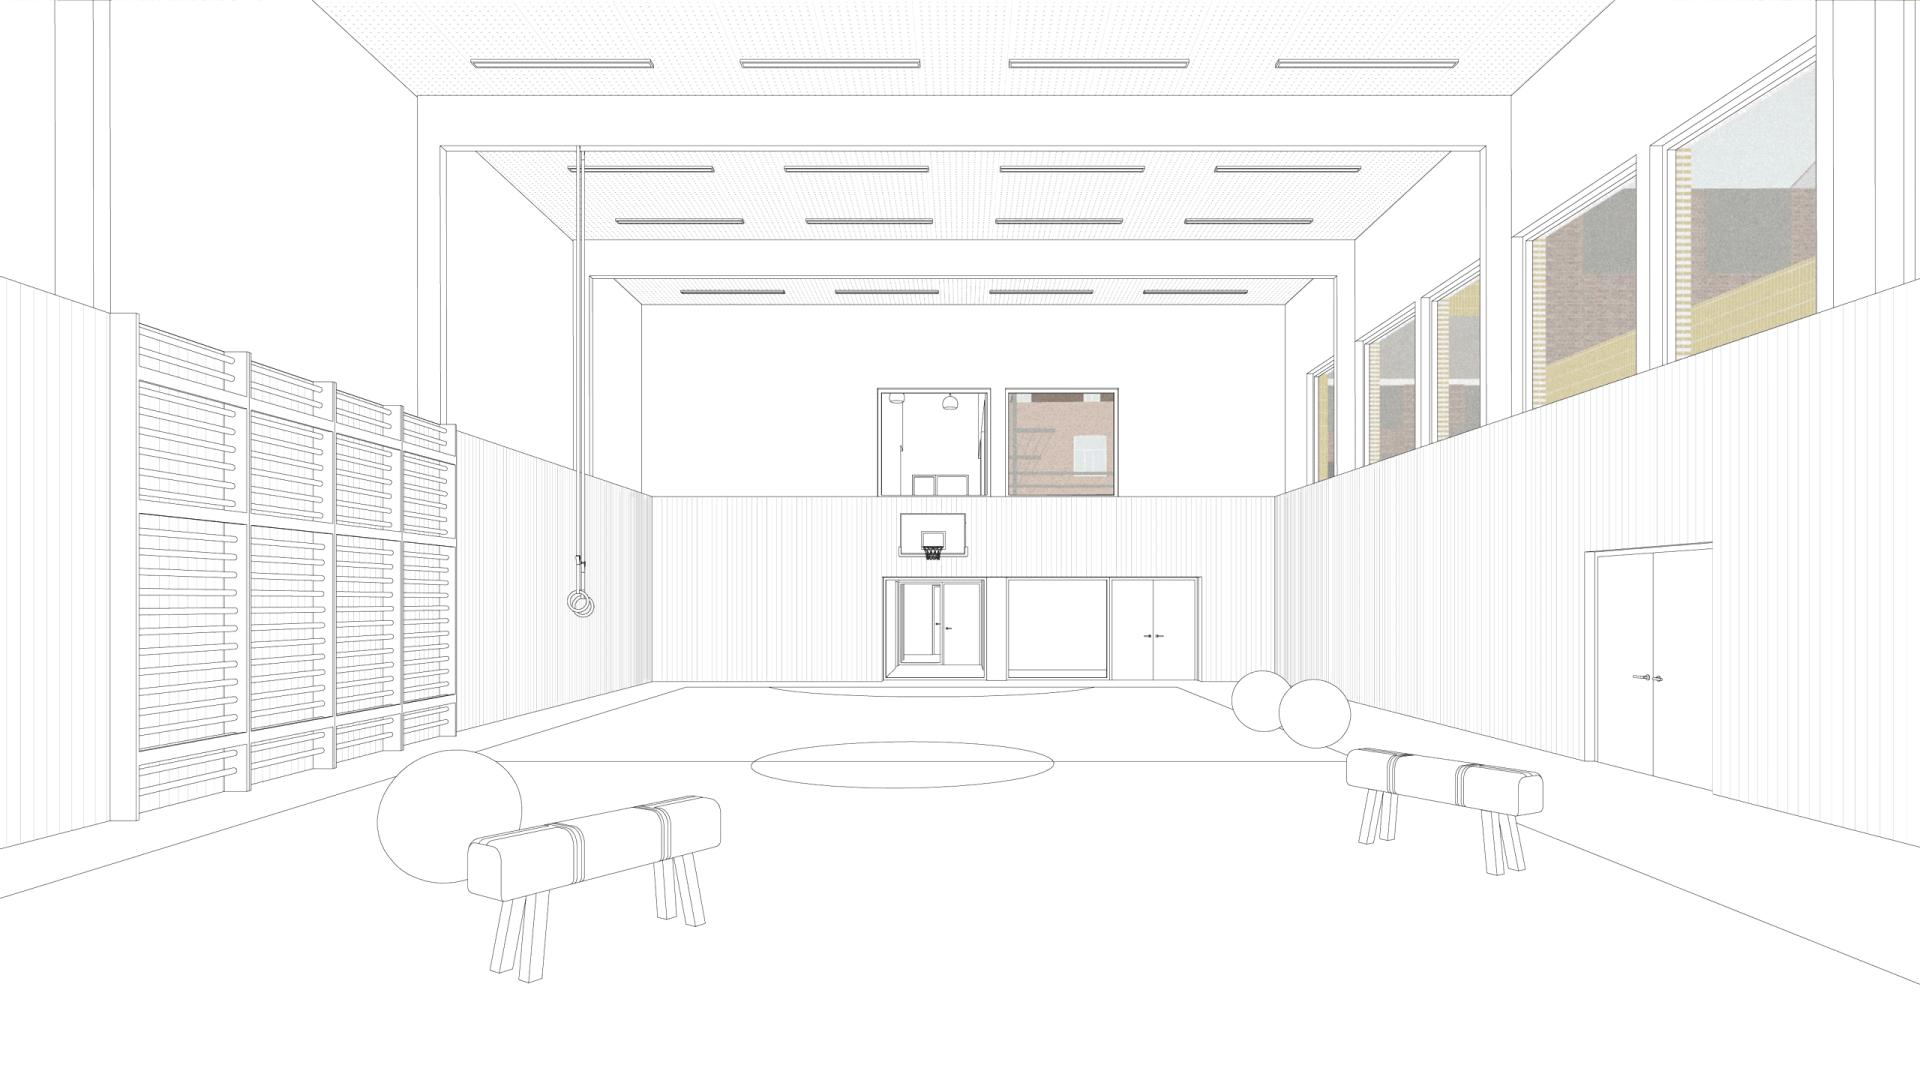 Everaert Collage In Gym